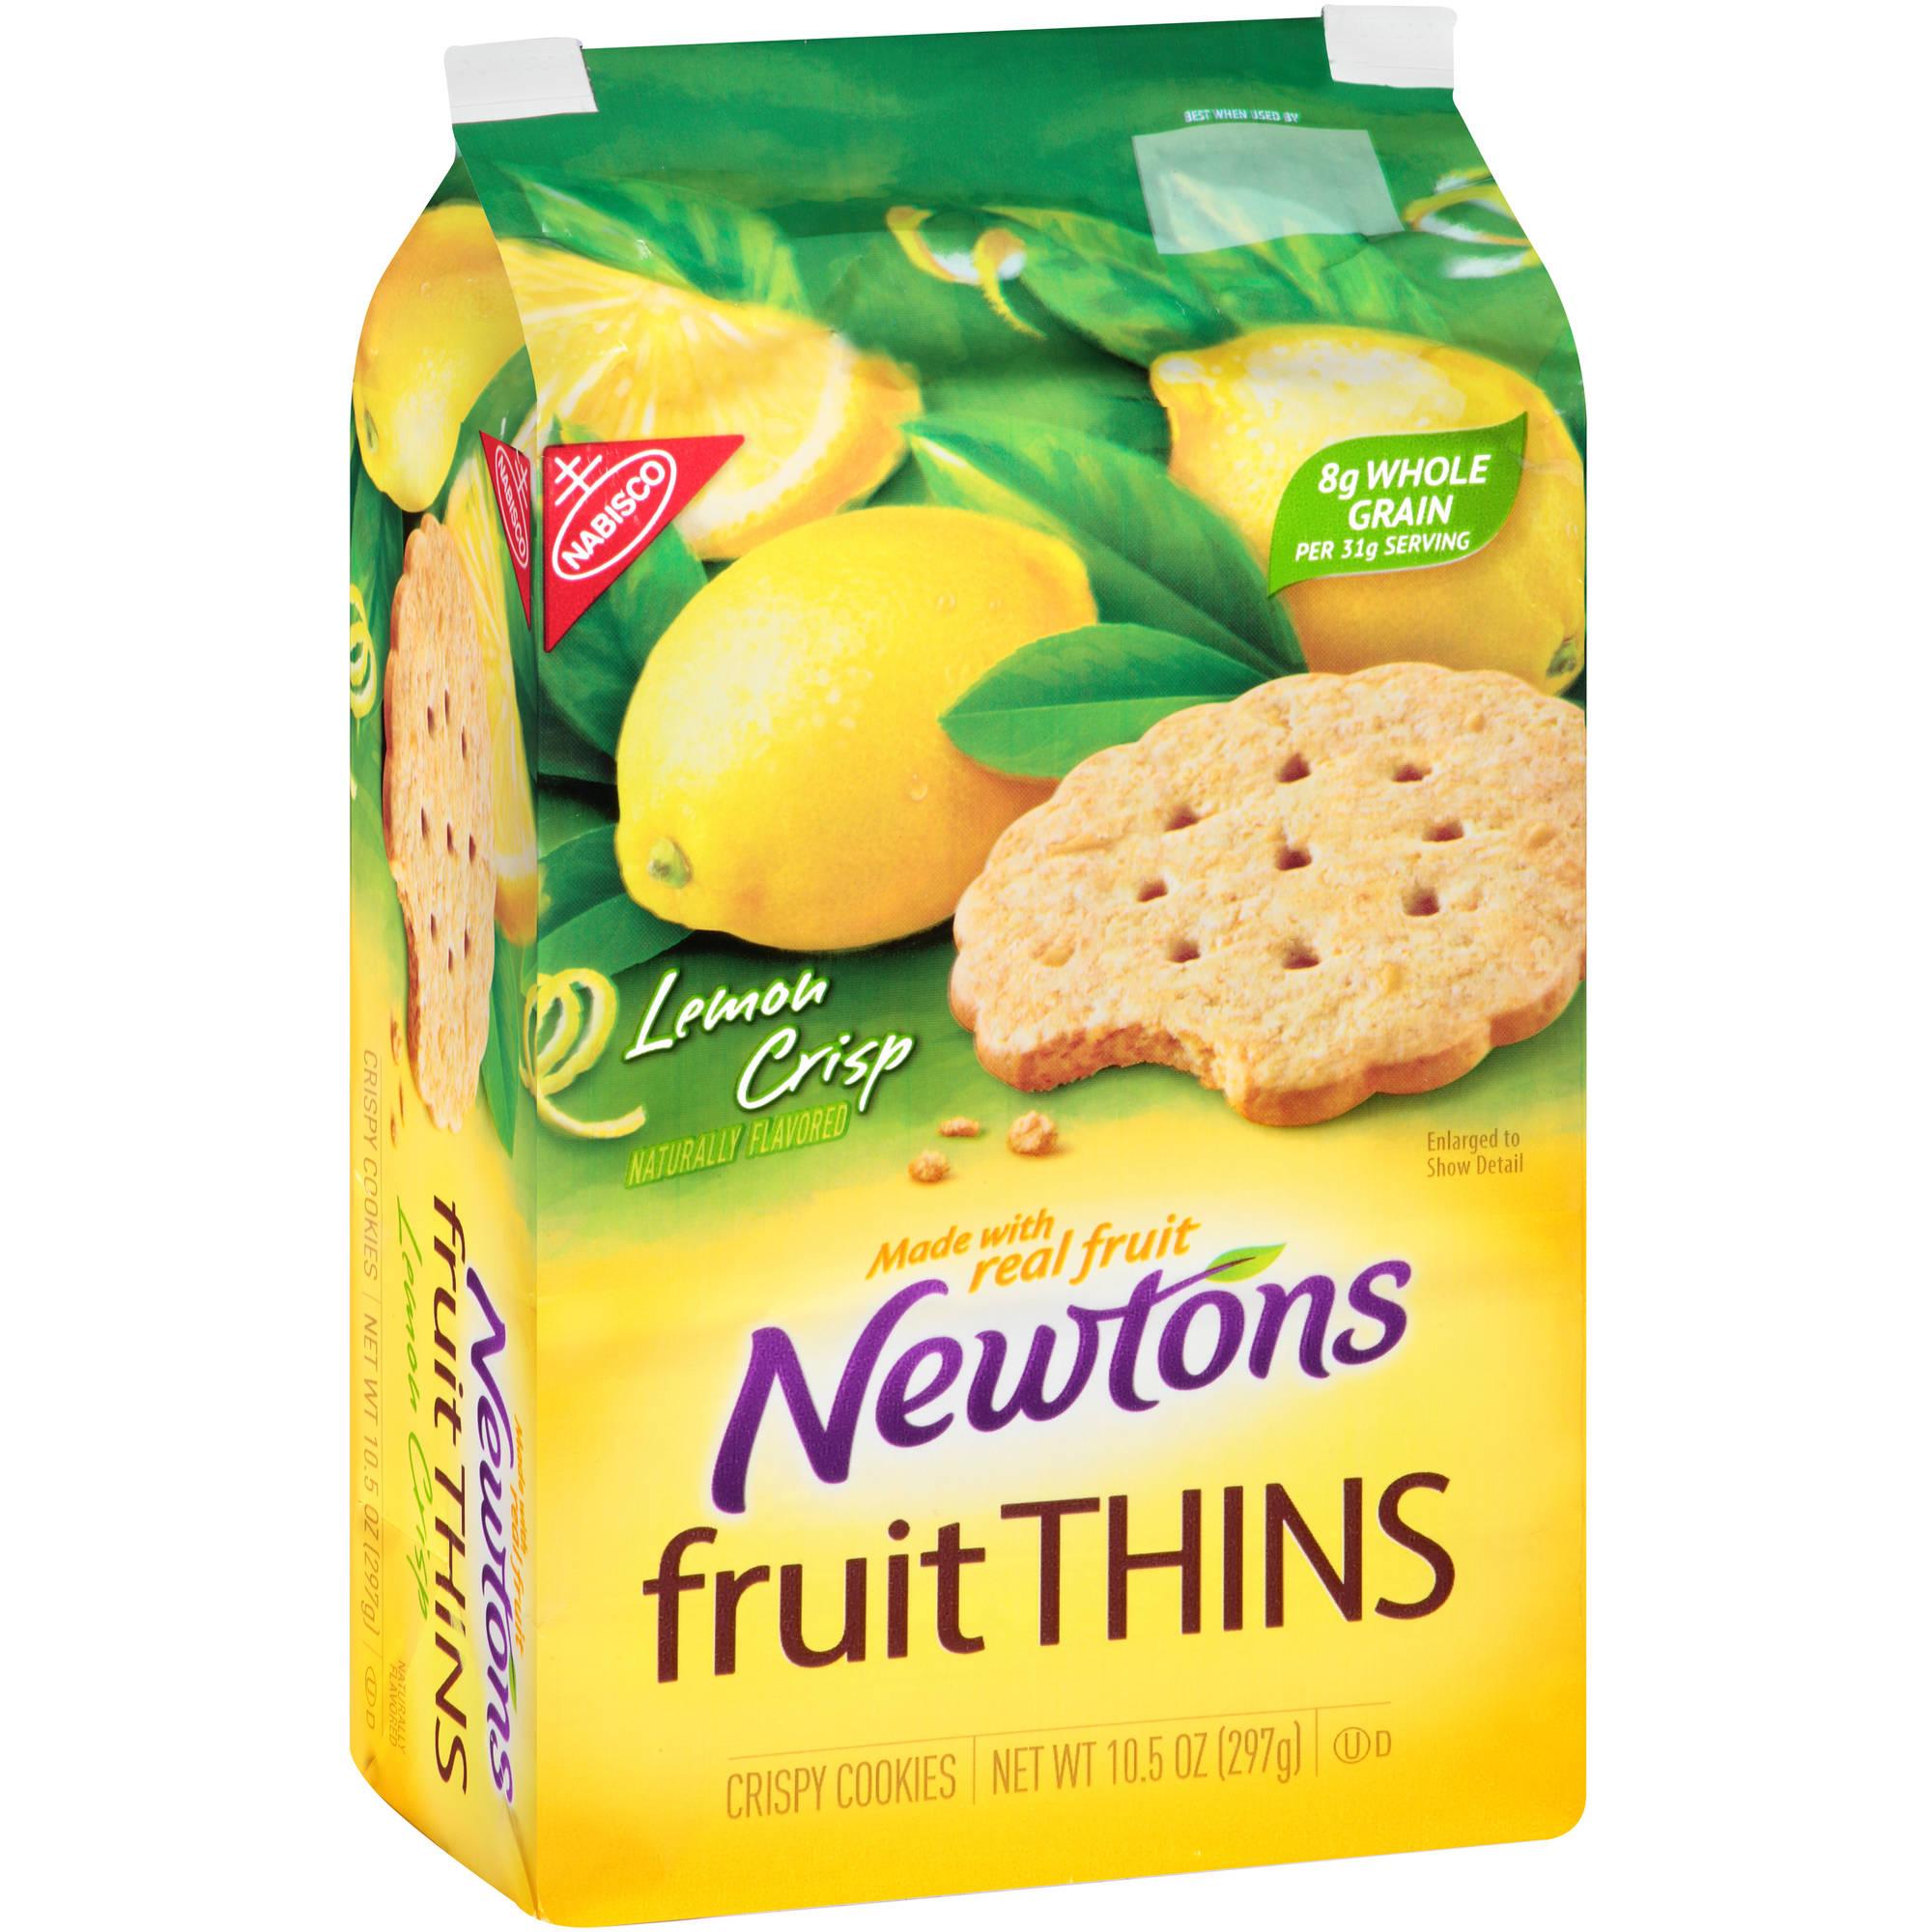 Nabisco Newtons Fruit Thins Lemon Crisp Crispy Cookies, 10.5 oz